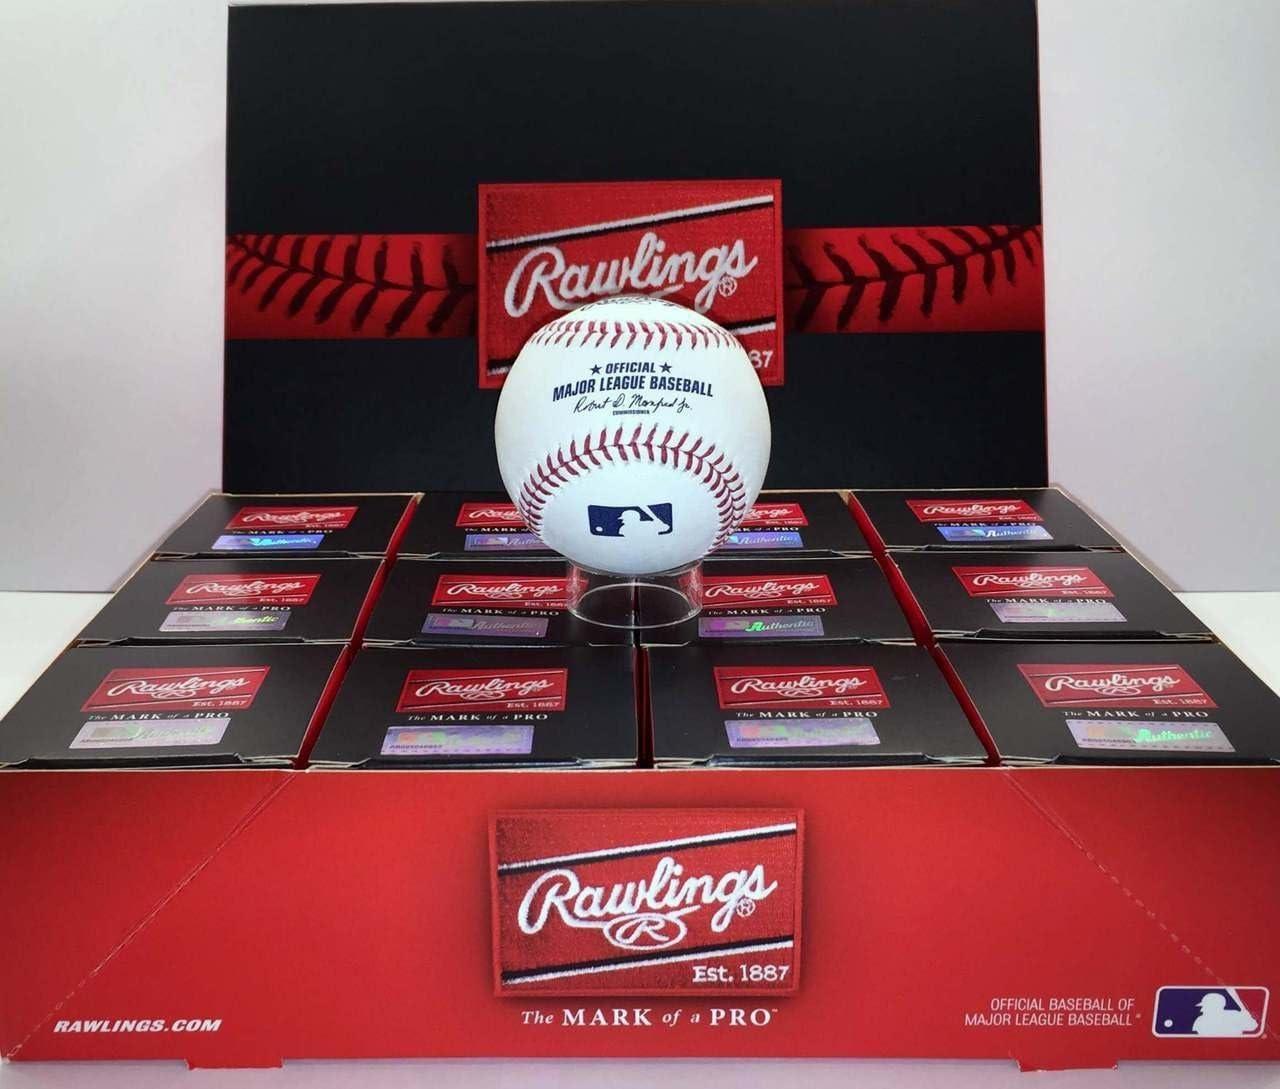 Rawlings公式メジャーリーグBaseballs (Dozens) 1ダース